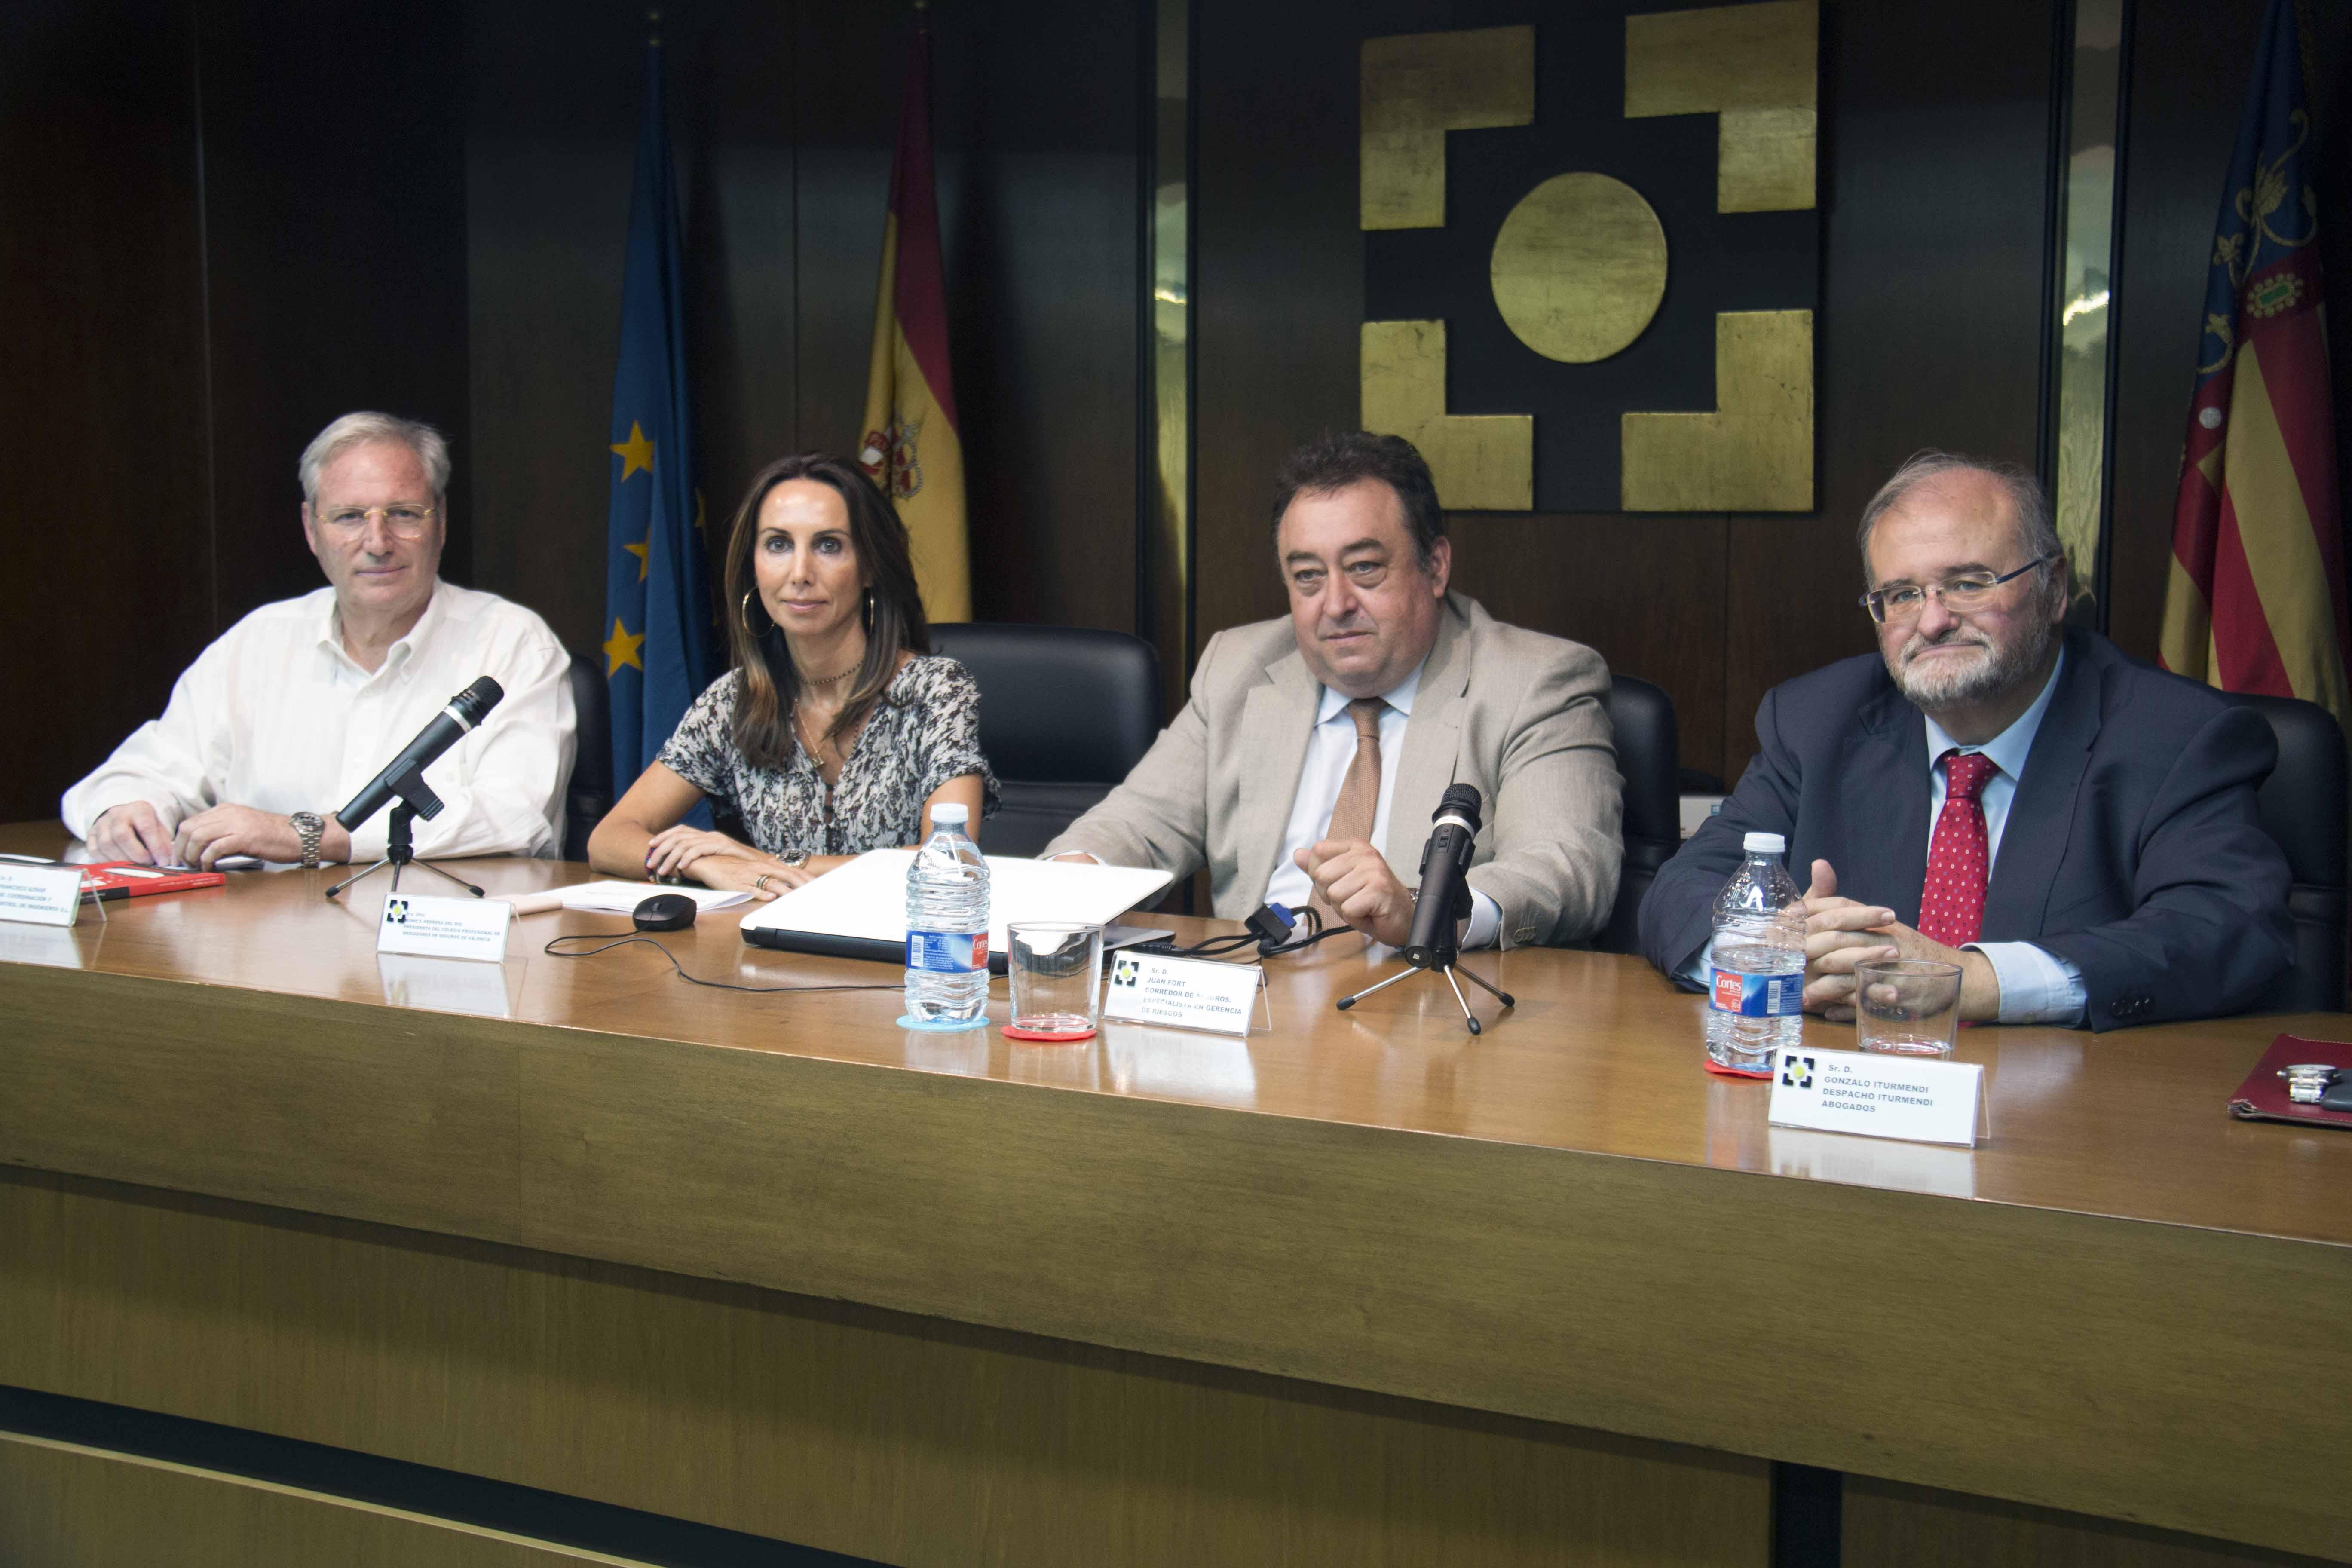 De izquierda a derecha: Francisco Aznar (CyC-Ingenieros), Mónica Herrera (Colegio mediadores de Valencia), Juan Fort (Protector RM) y Gonzalo Iturmendi (Agers),